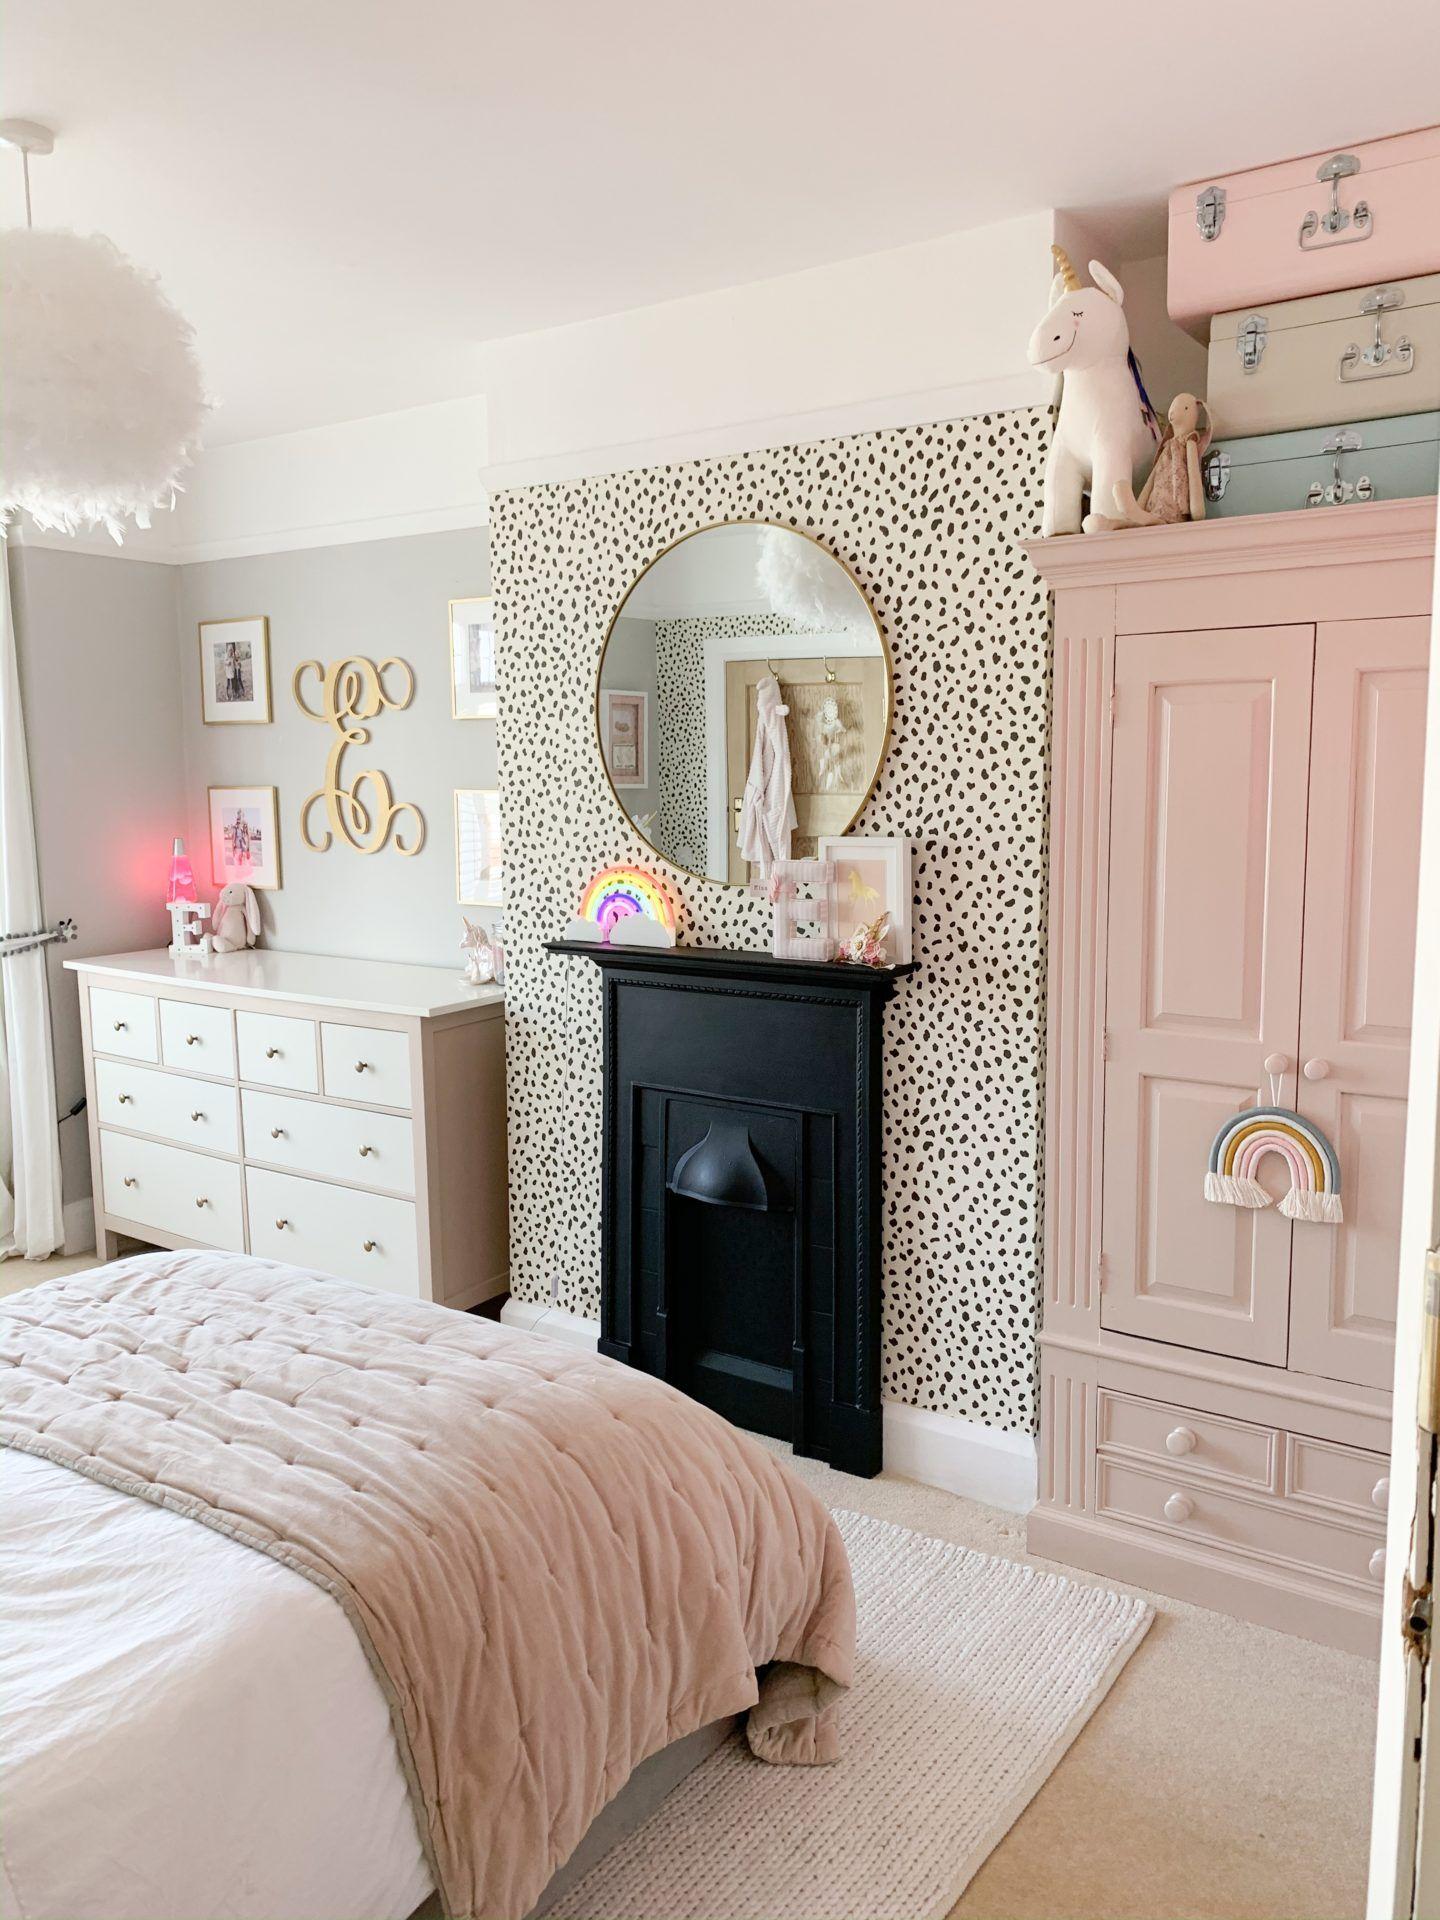 A Girl Power Bedroom